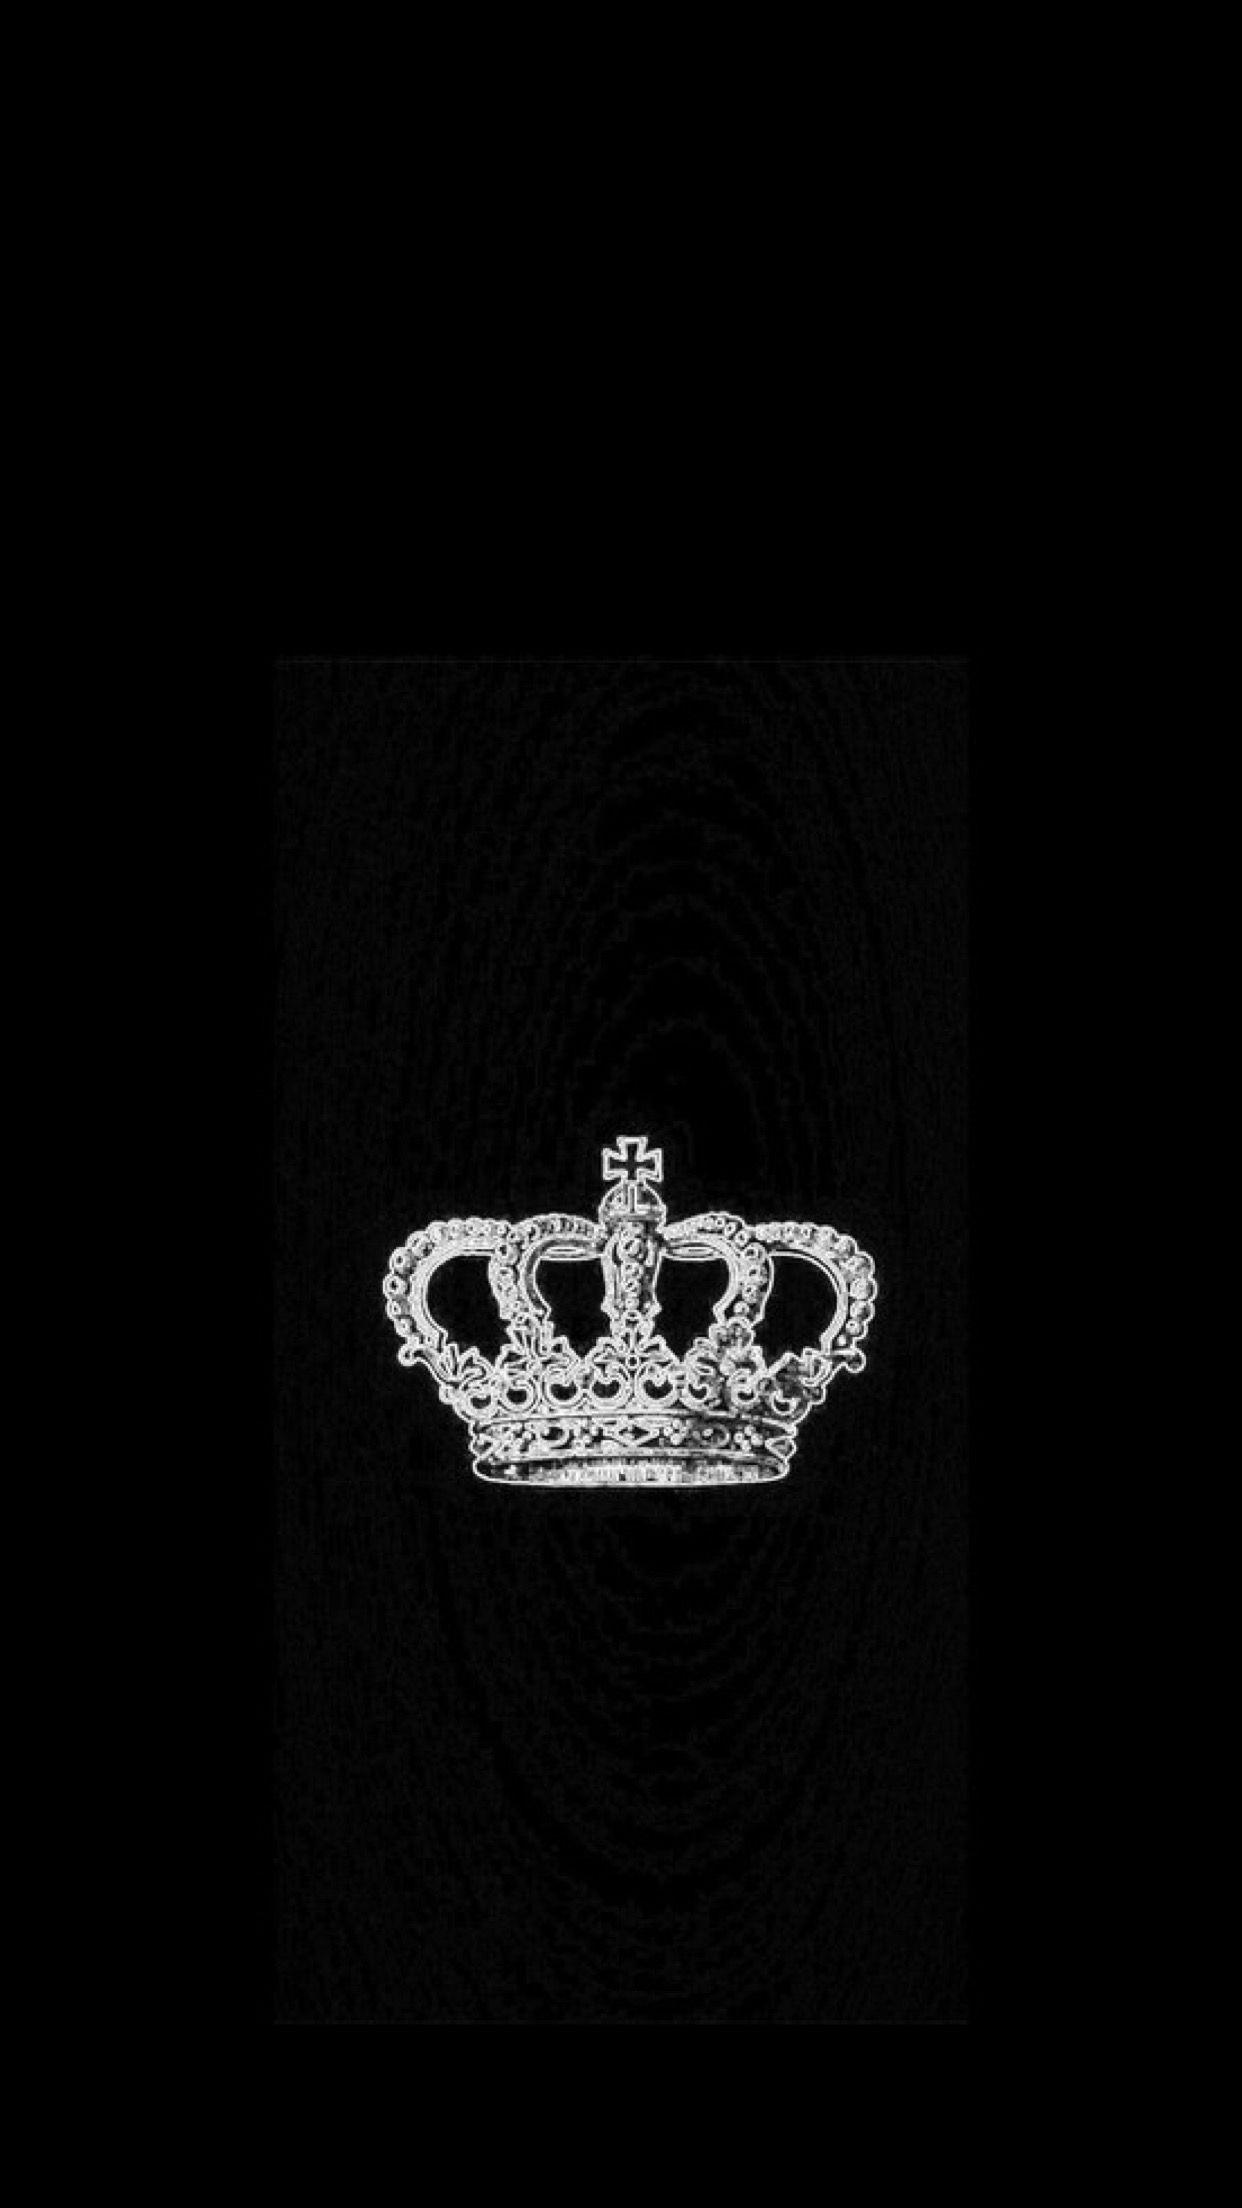 Pin by Alexa Krause on ∞Artsy∞ Pinterest Crown